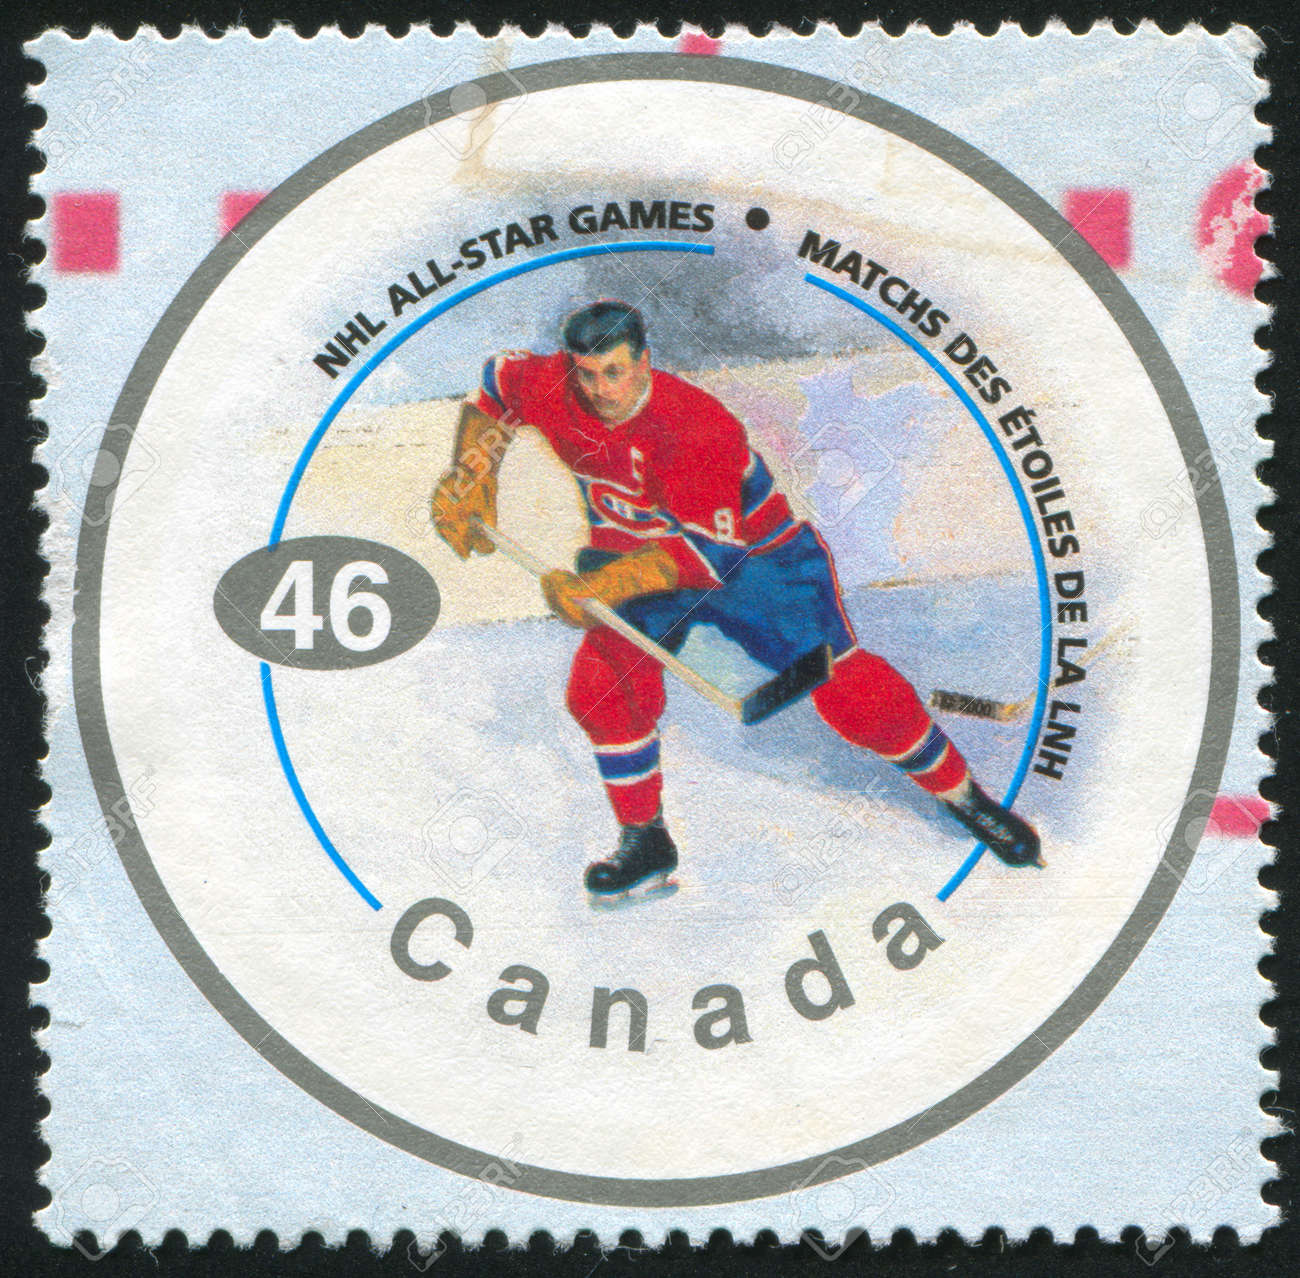 CANADA - CIRCA 2000: stamp printed by Canada, shows hockey player, circa 2000 Stock Photo - 9674907